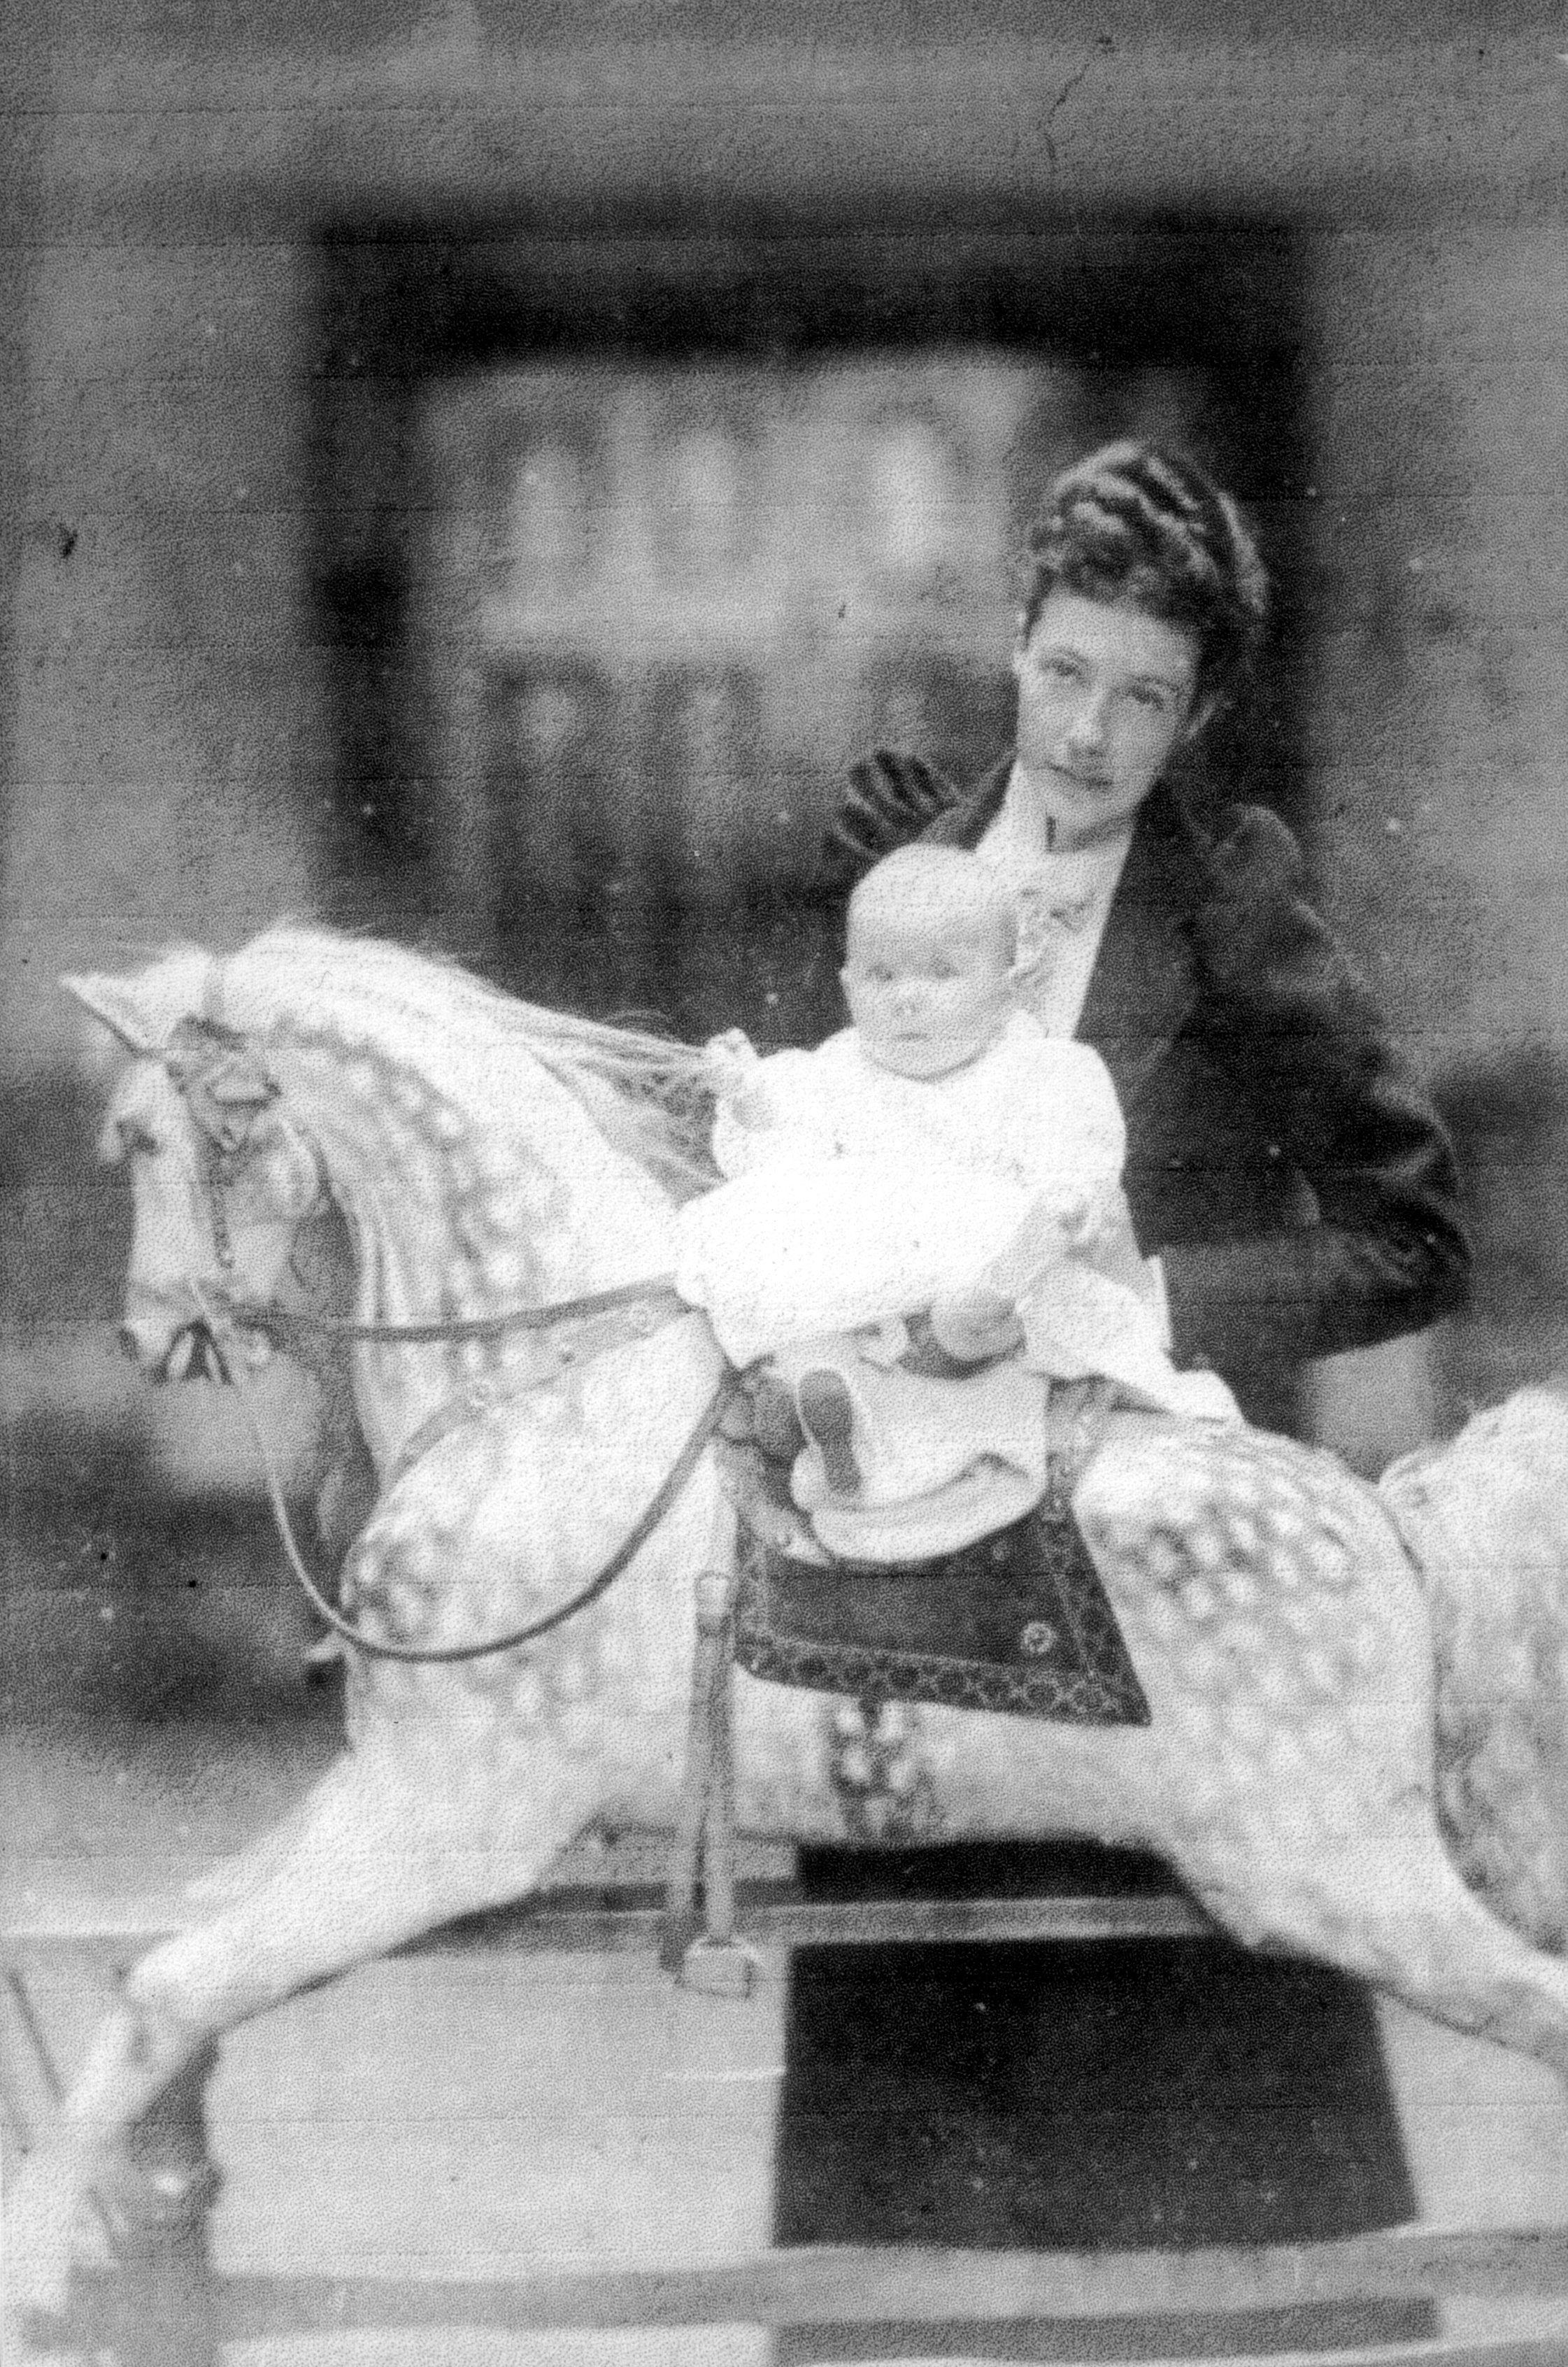 Geraldine Gilbert Henry, daughter of Margaret and Mitchell